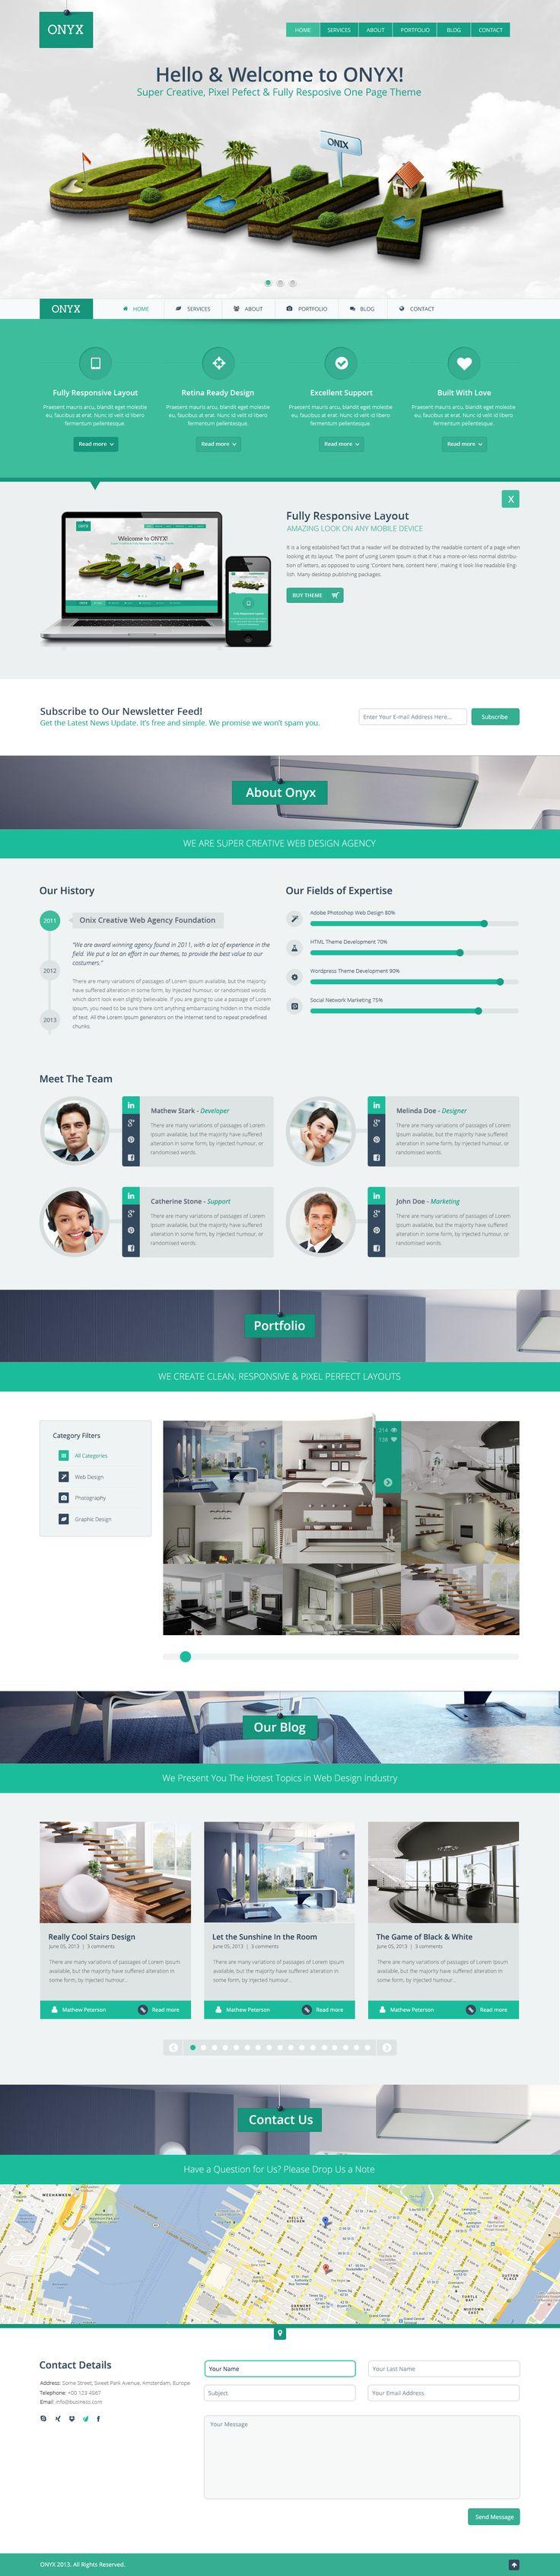 inspiring web design